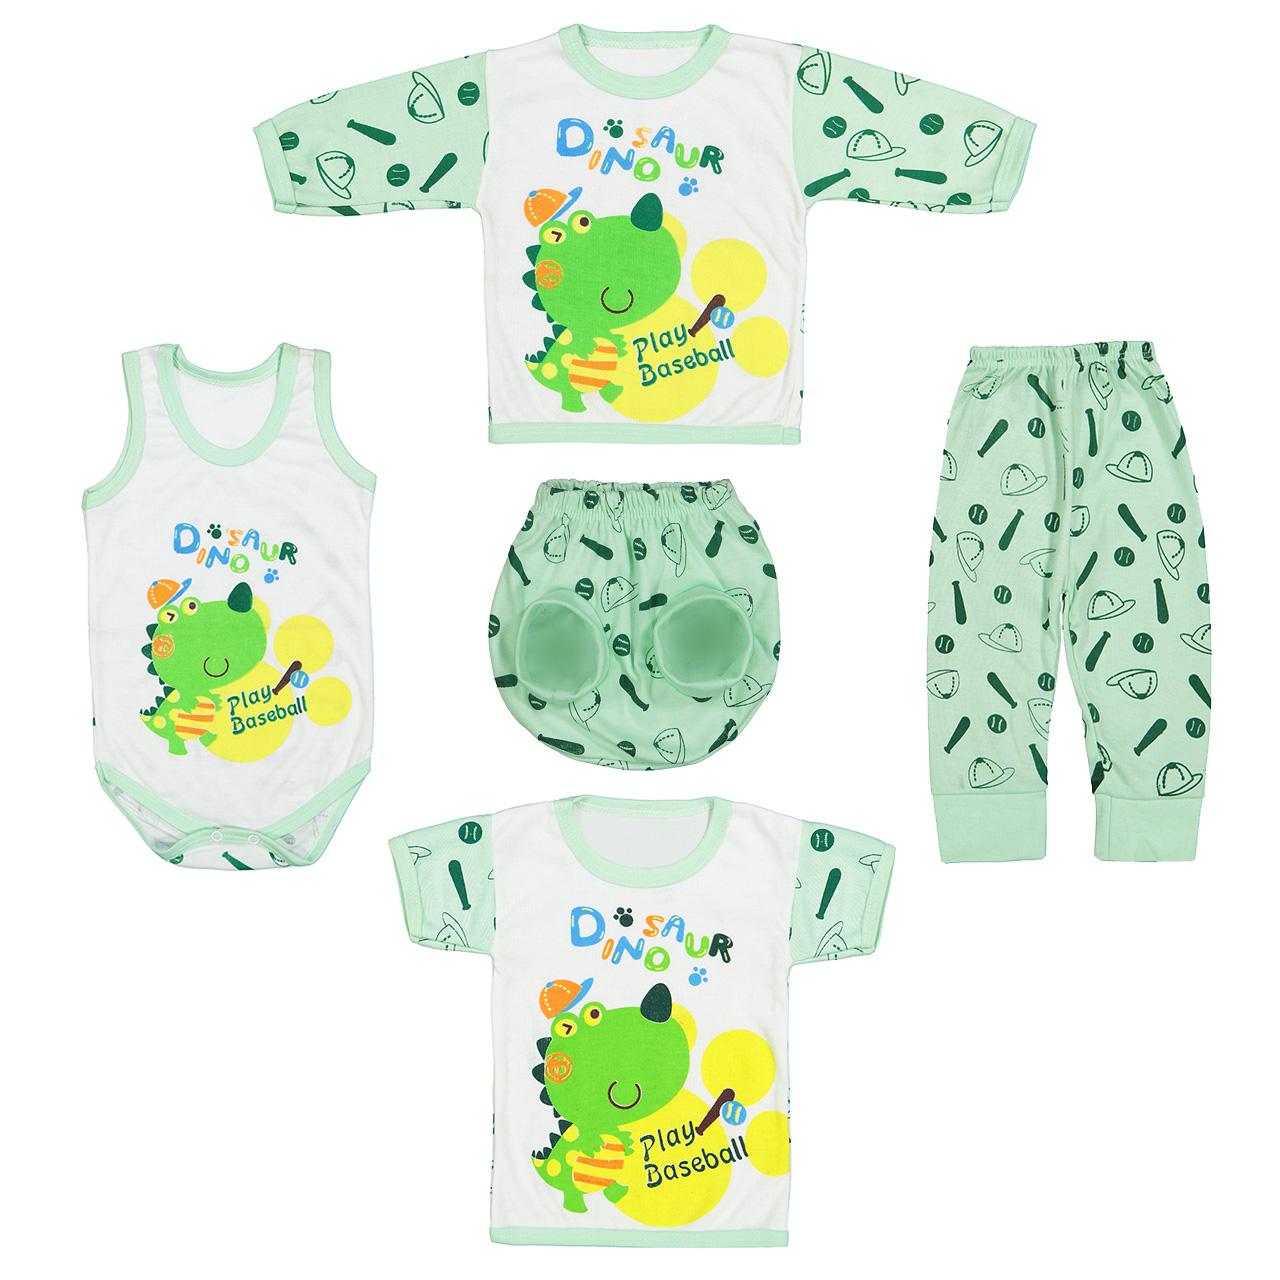 ست 5 تکه لباس نوزادی طرح دایناسور کد M24